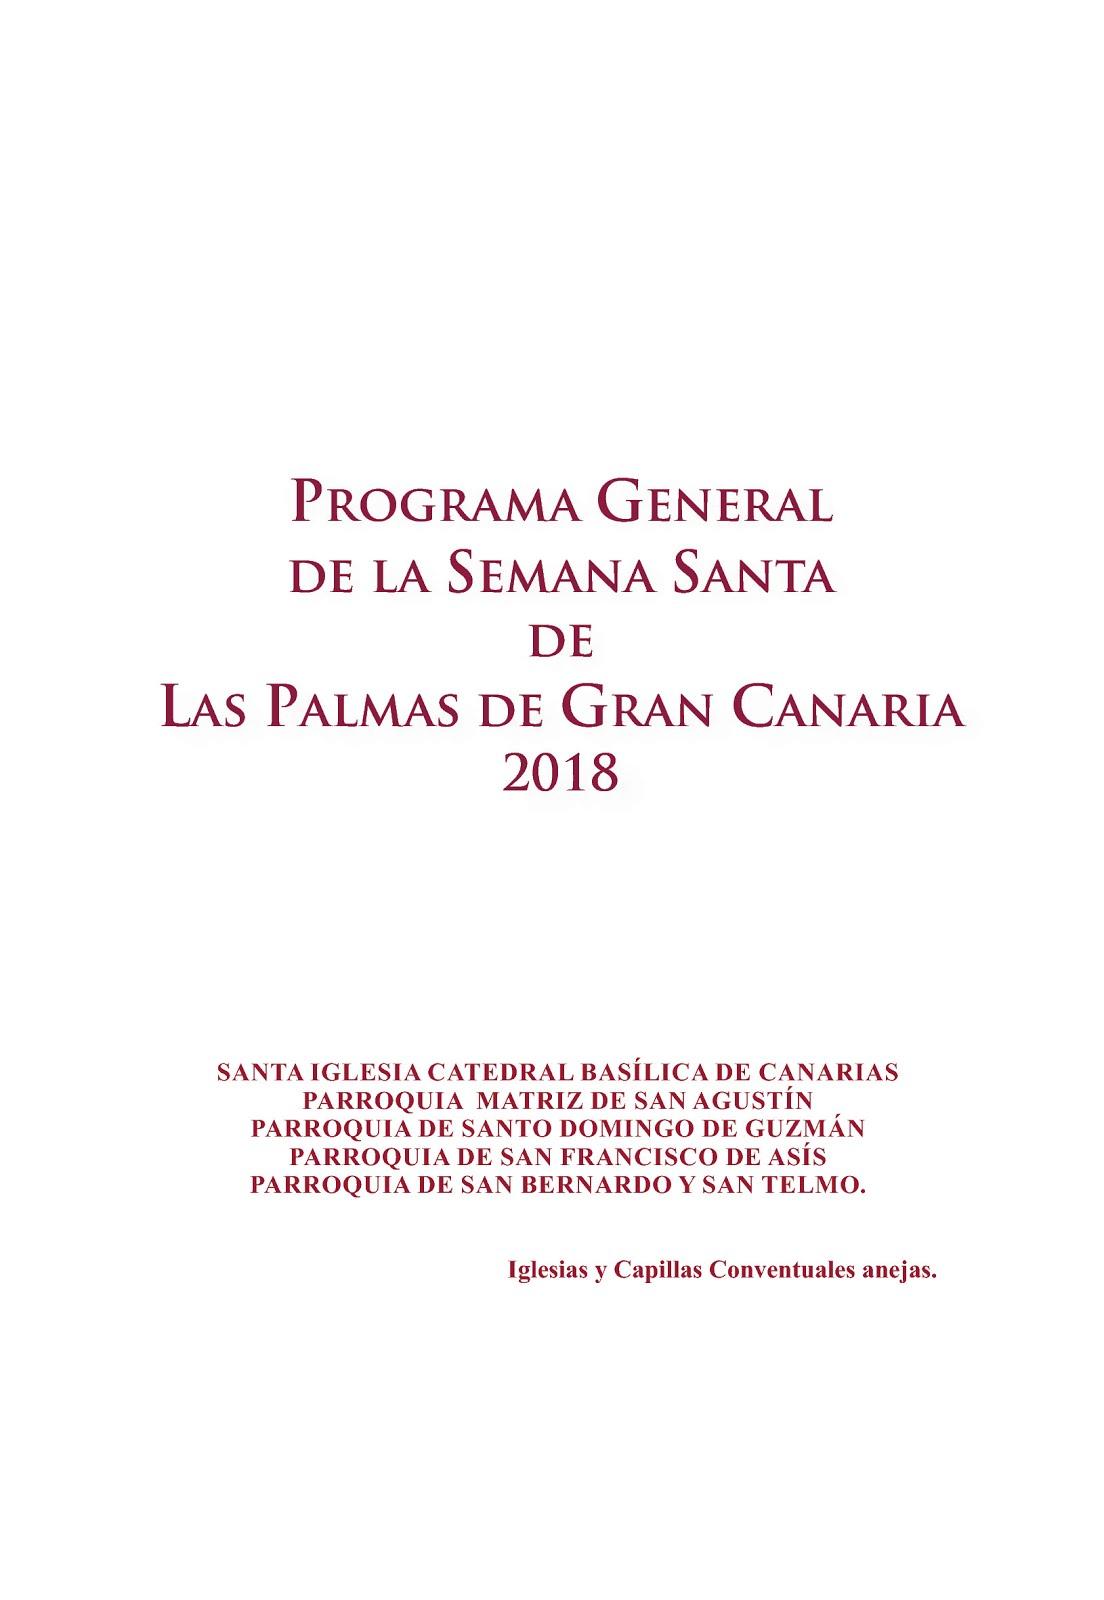 PROGRAMA GENERAL SEMANA SANTA 2018